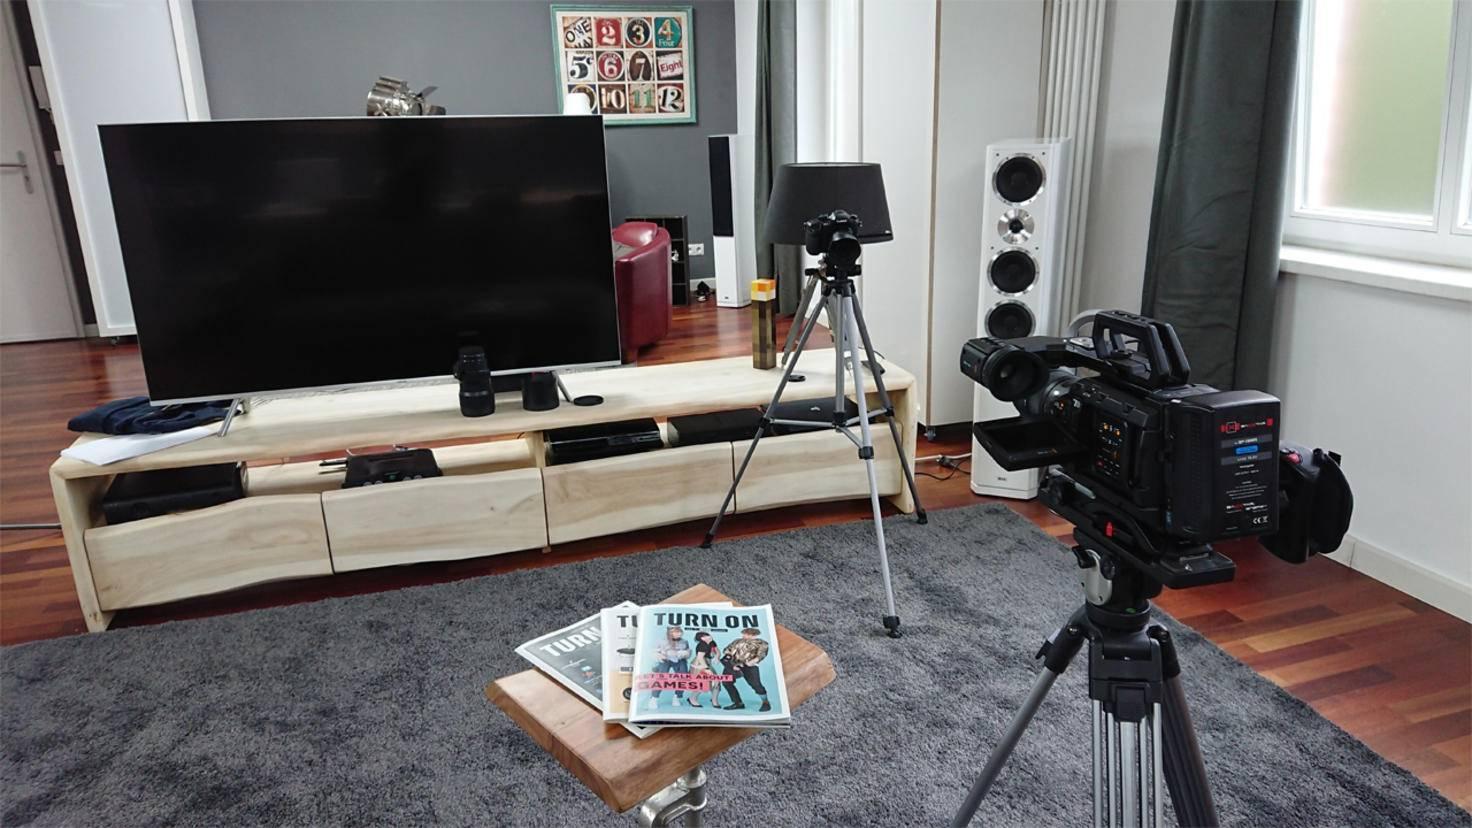 Die Hauptkamera fotografiert mit maximal 19 Megapixeln.